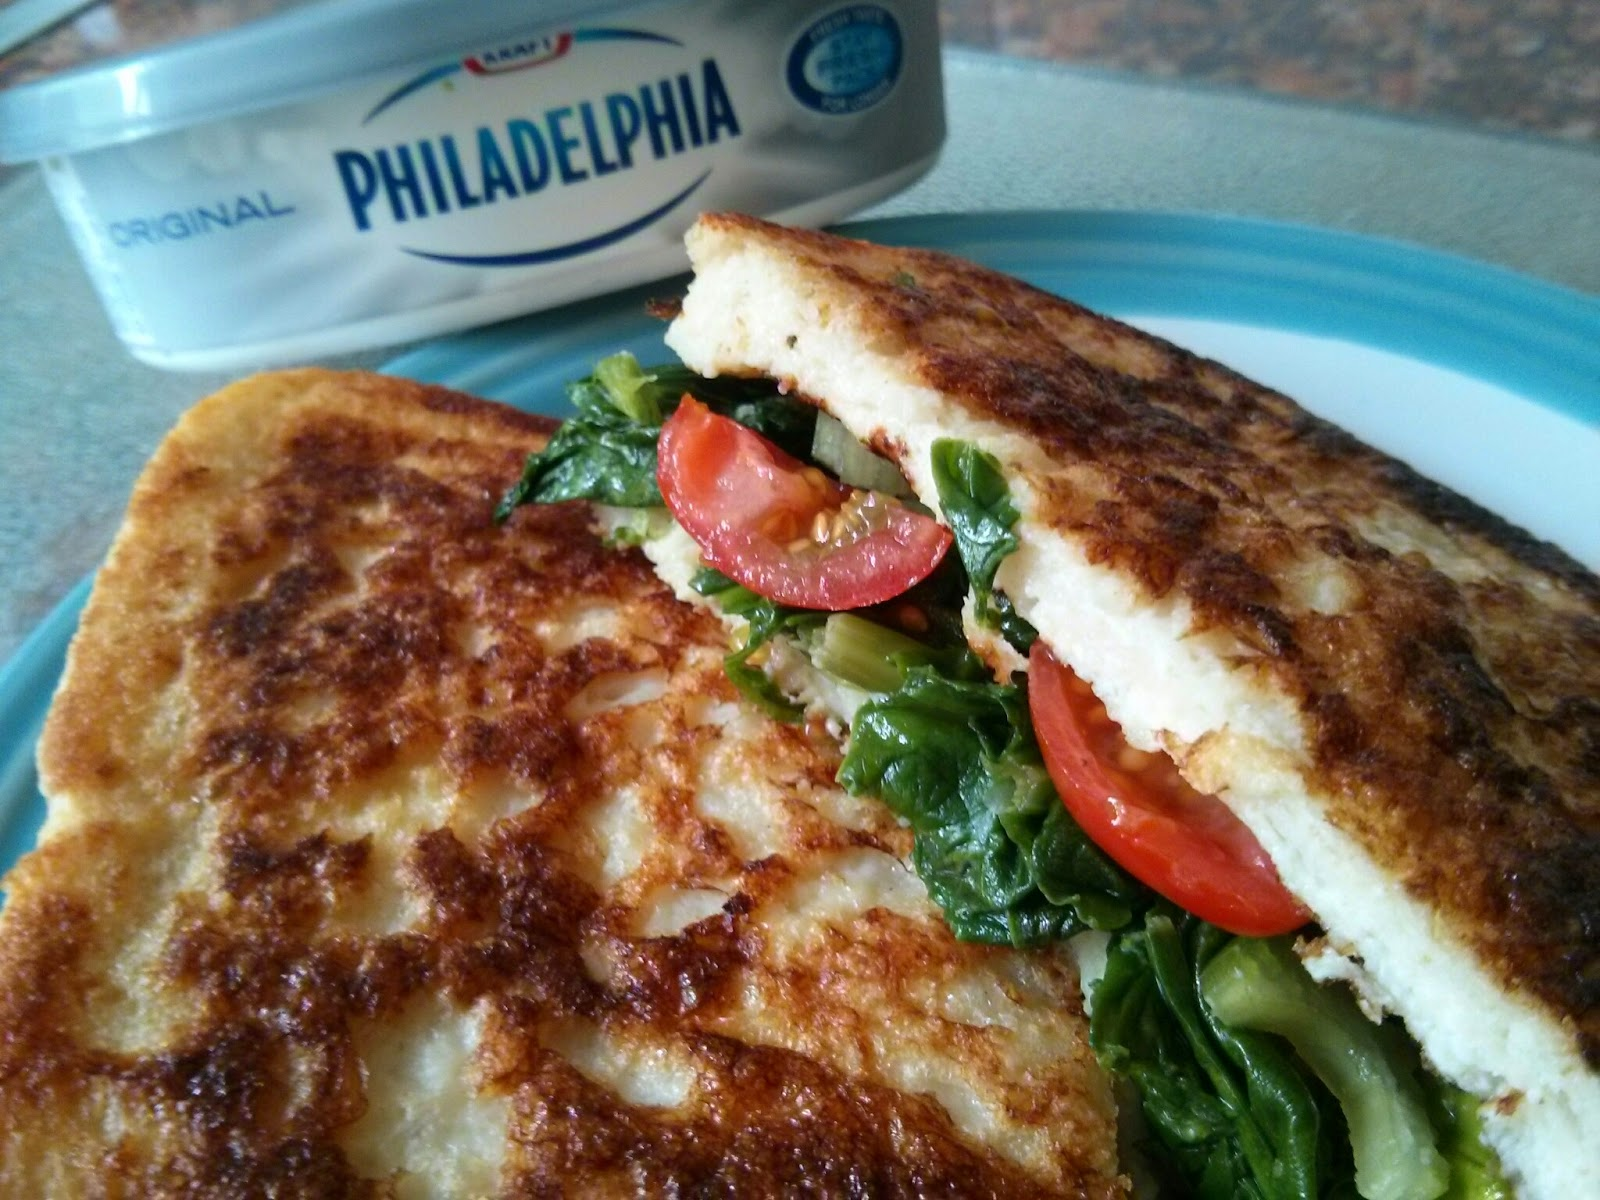 Millionaire's Spinach, Tomato and Philadelphia sandwich.